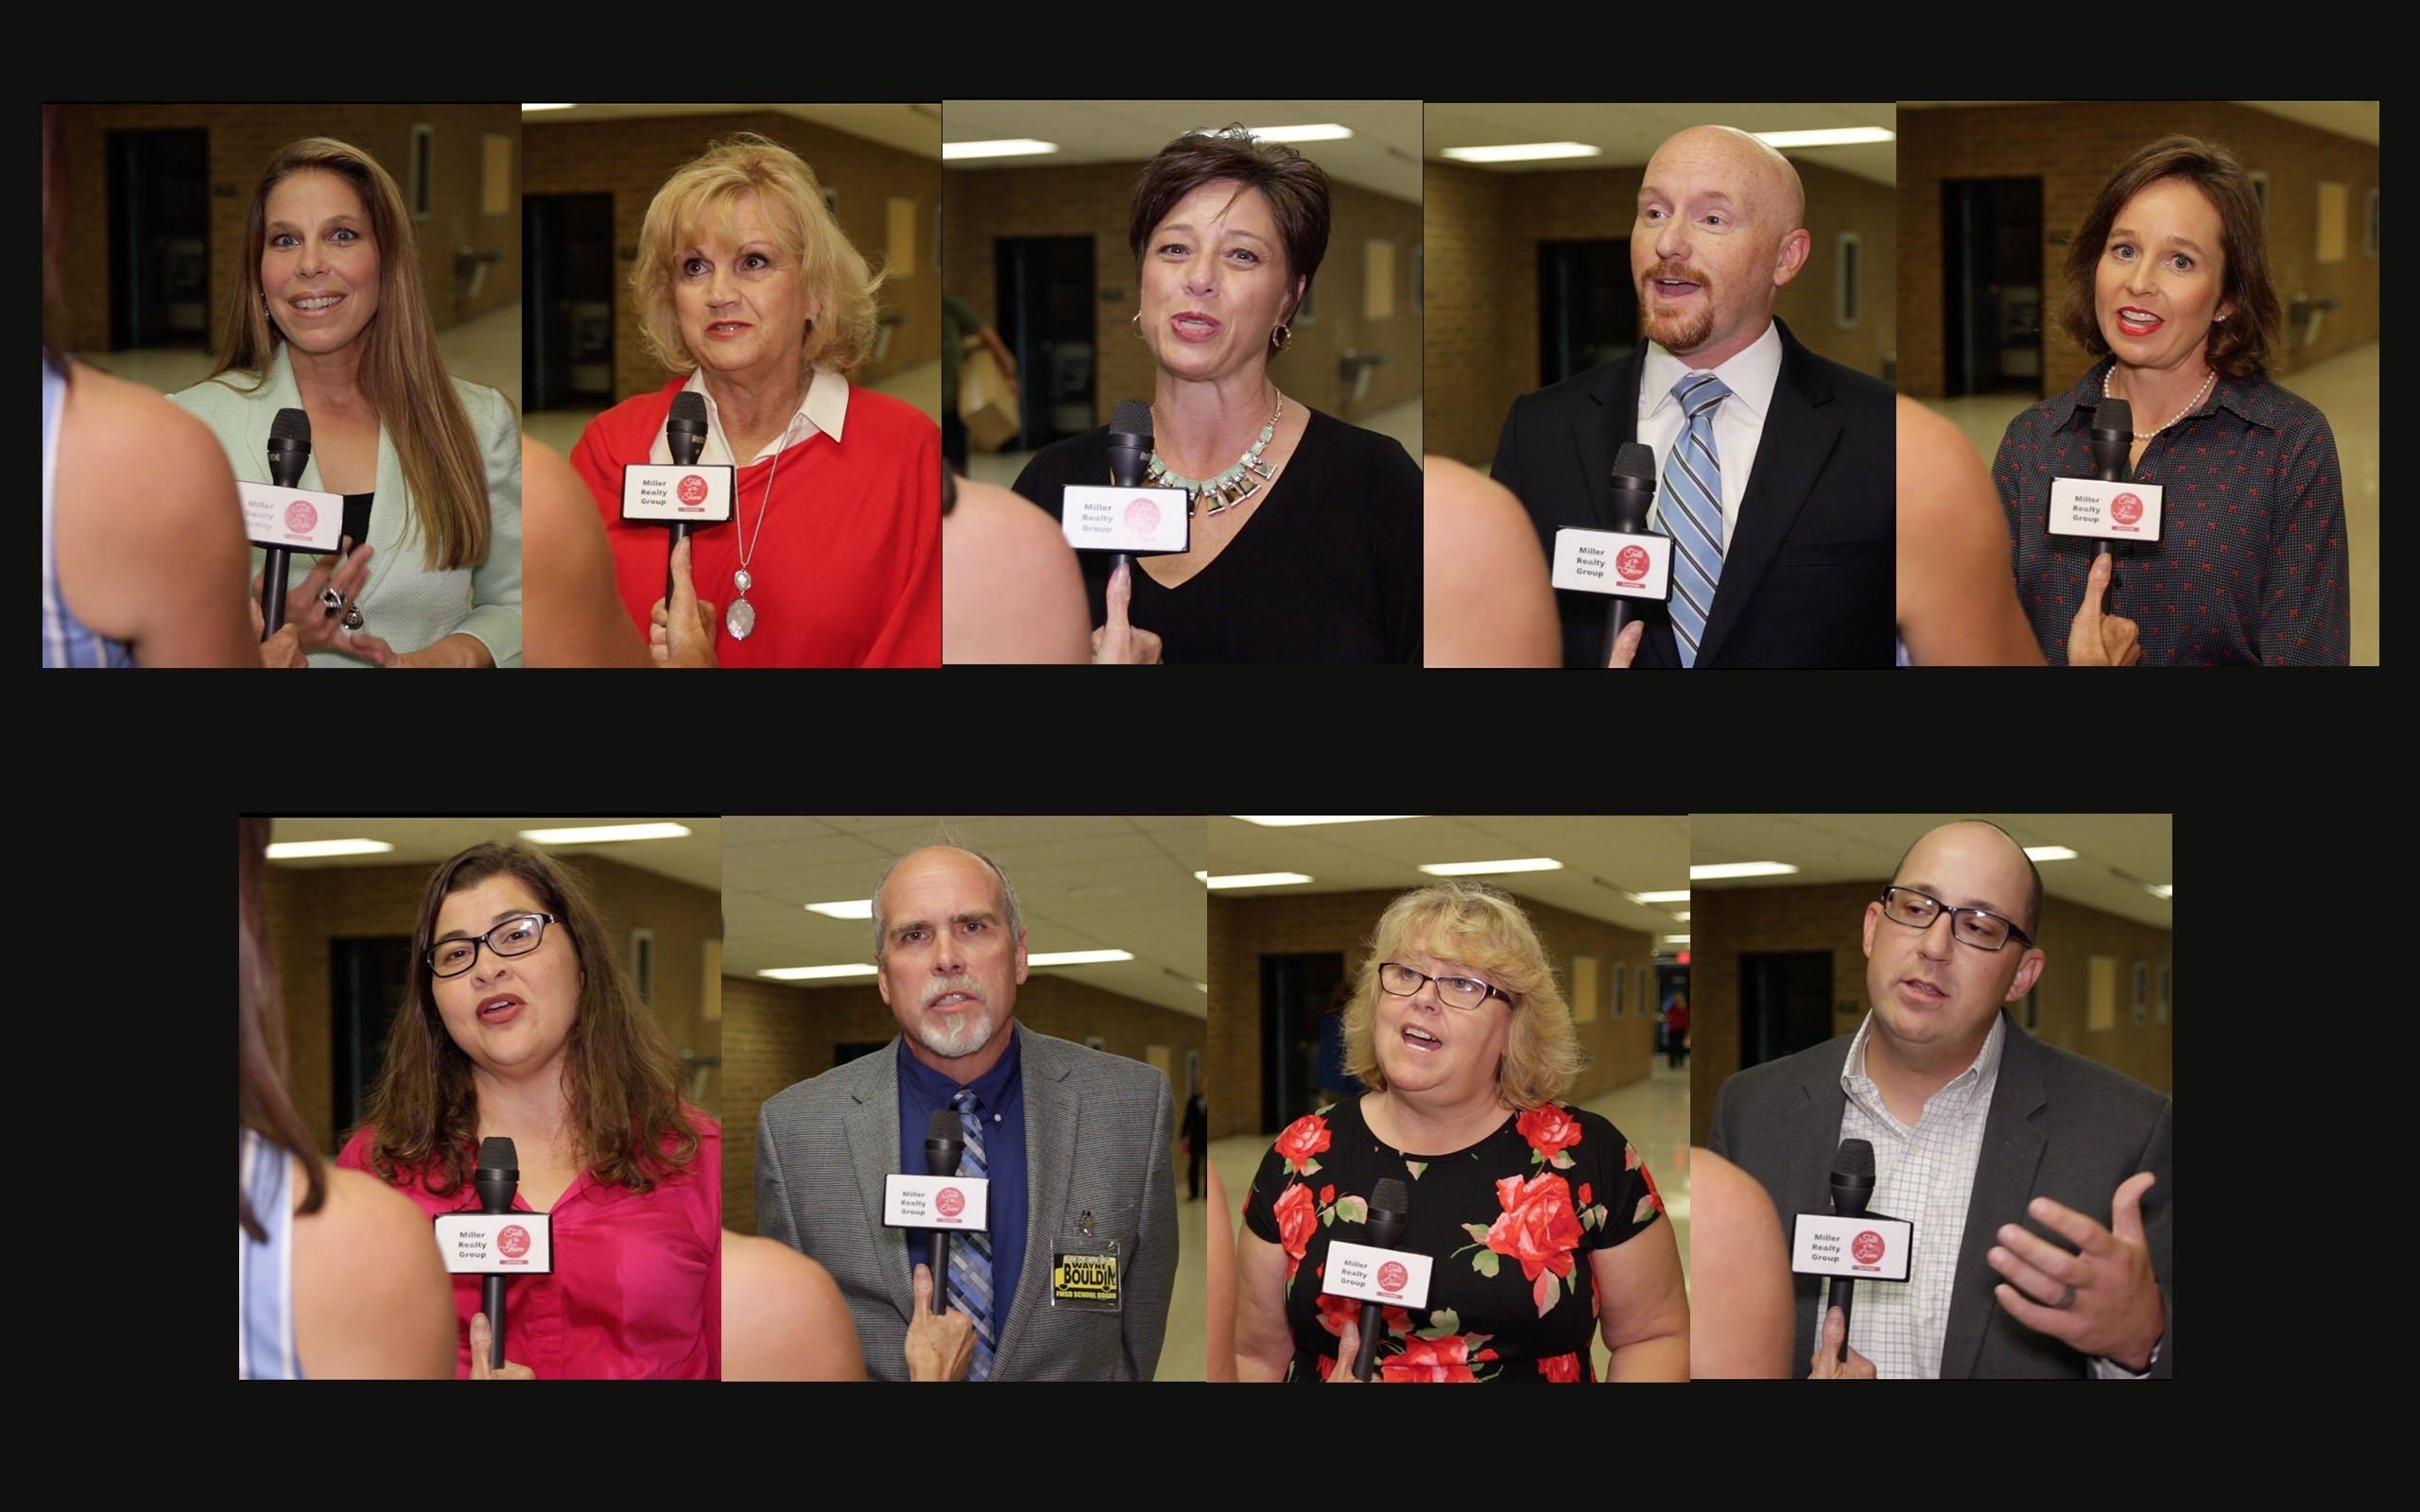 Fort Mill School Board Candidates 2018